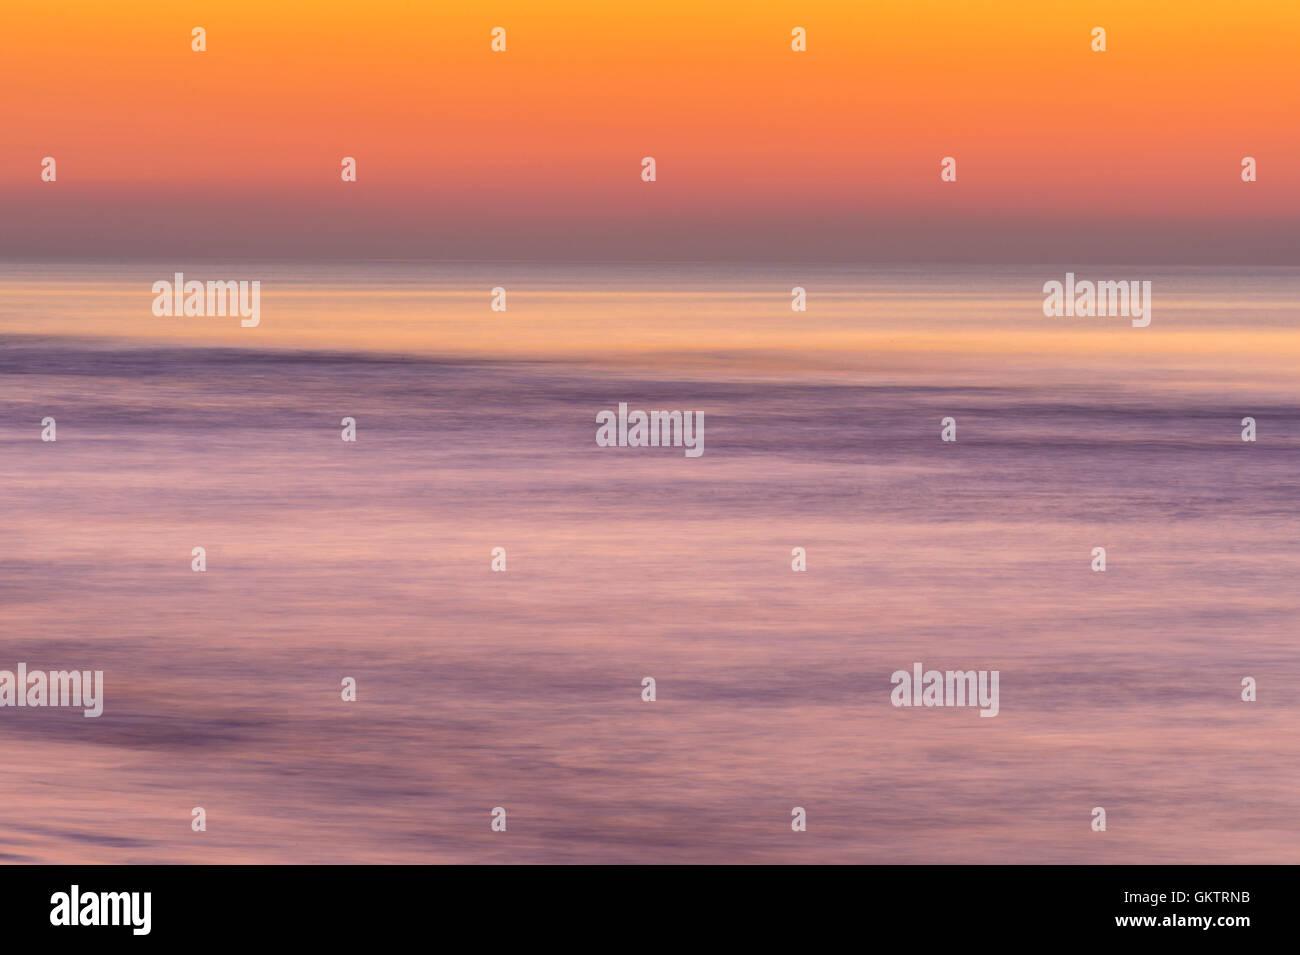 Flou artistique Sunrise Ocean Photo Stock